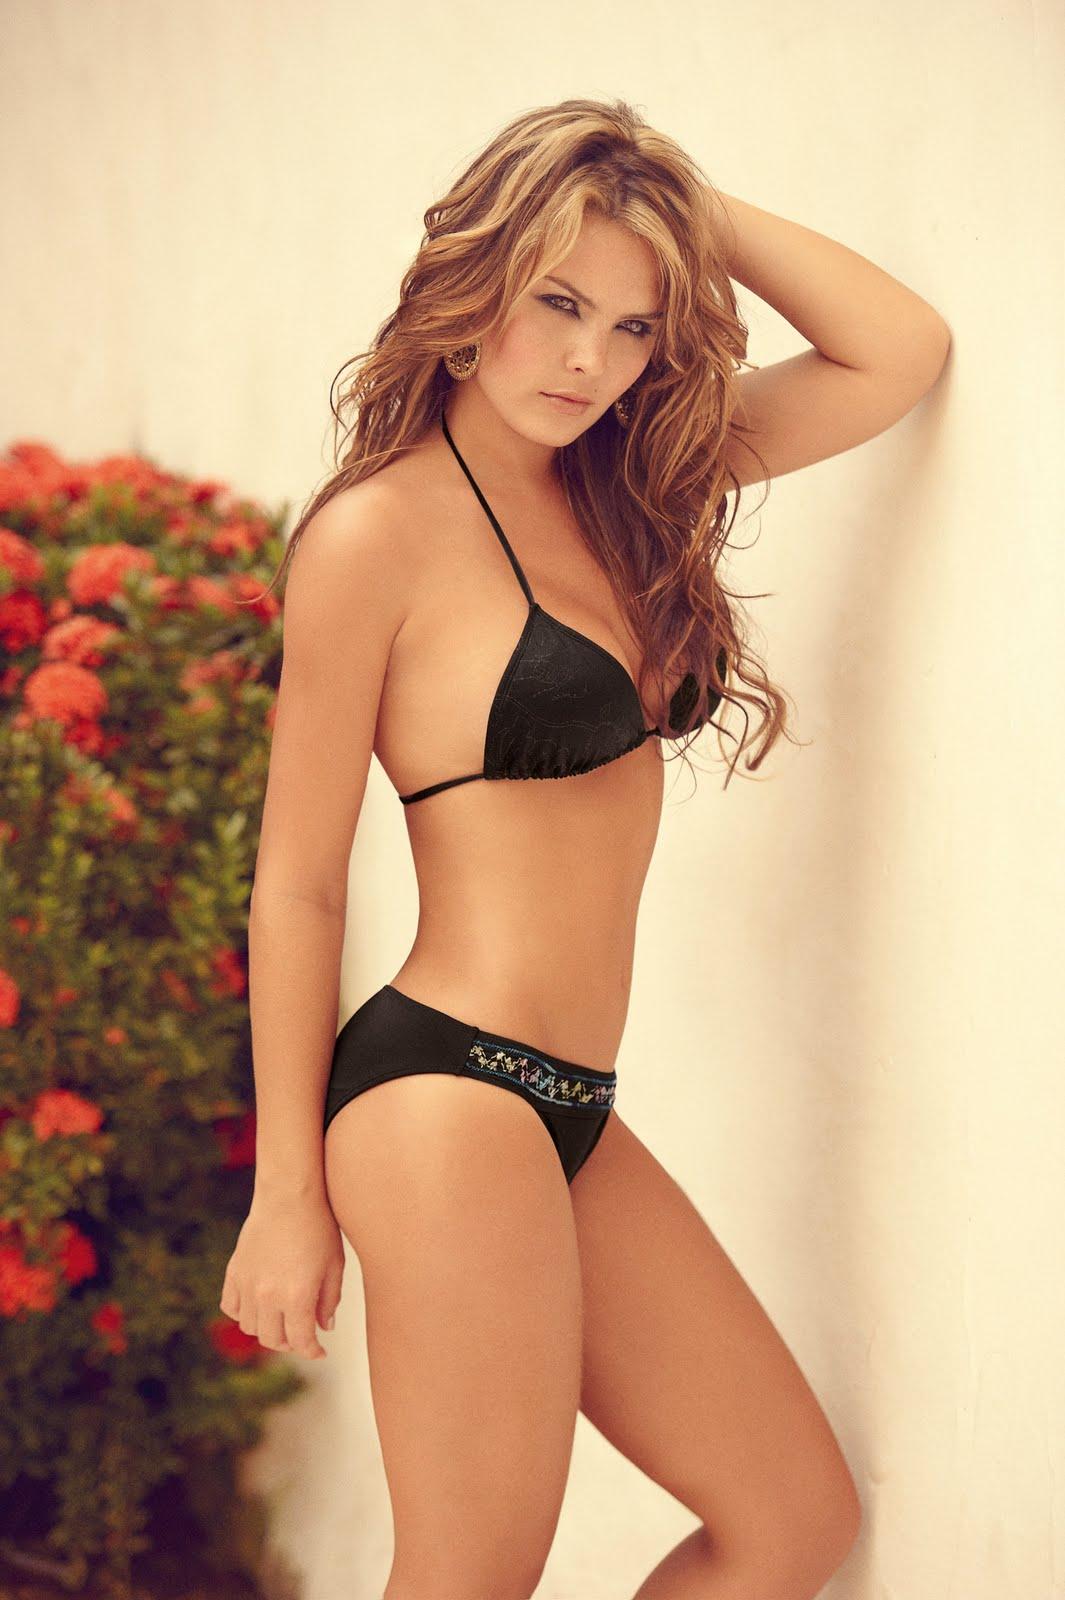 melissa giraldo bikini babestrip swimwear collection fotos drill oops